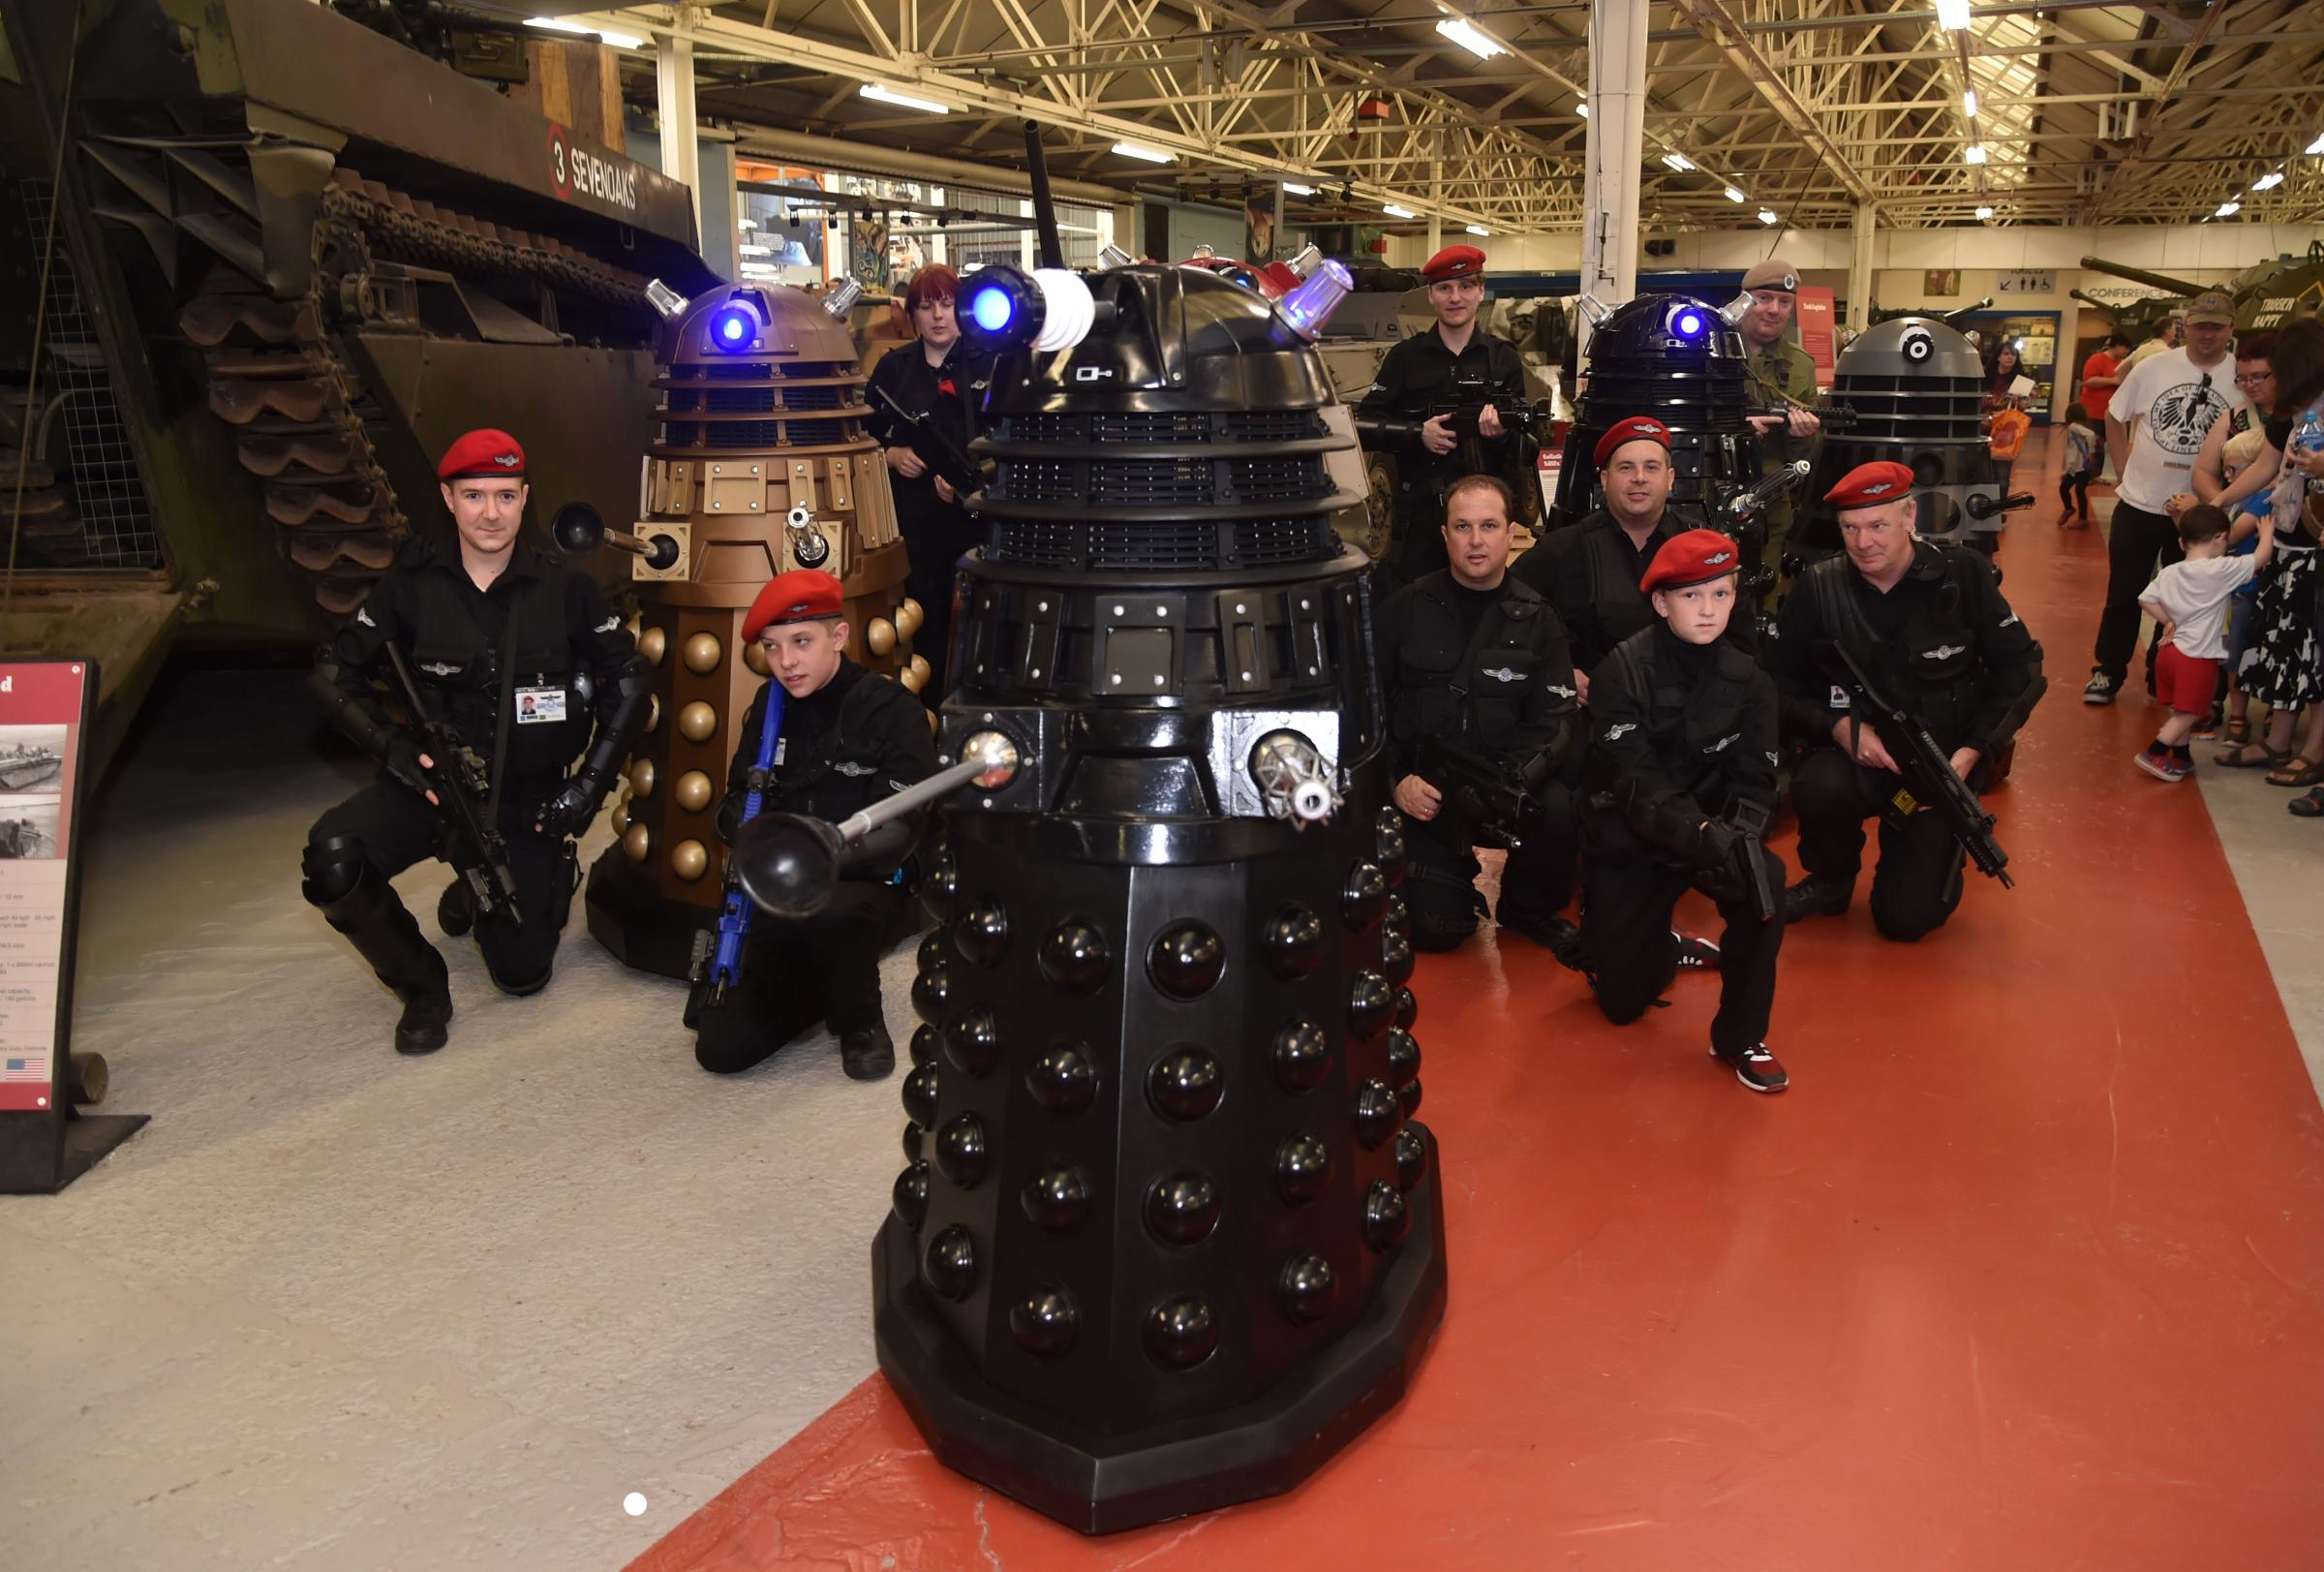 'EXTERMINATE':当Daleks入侵博物馆时,假期开始爆炸